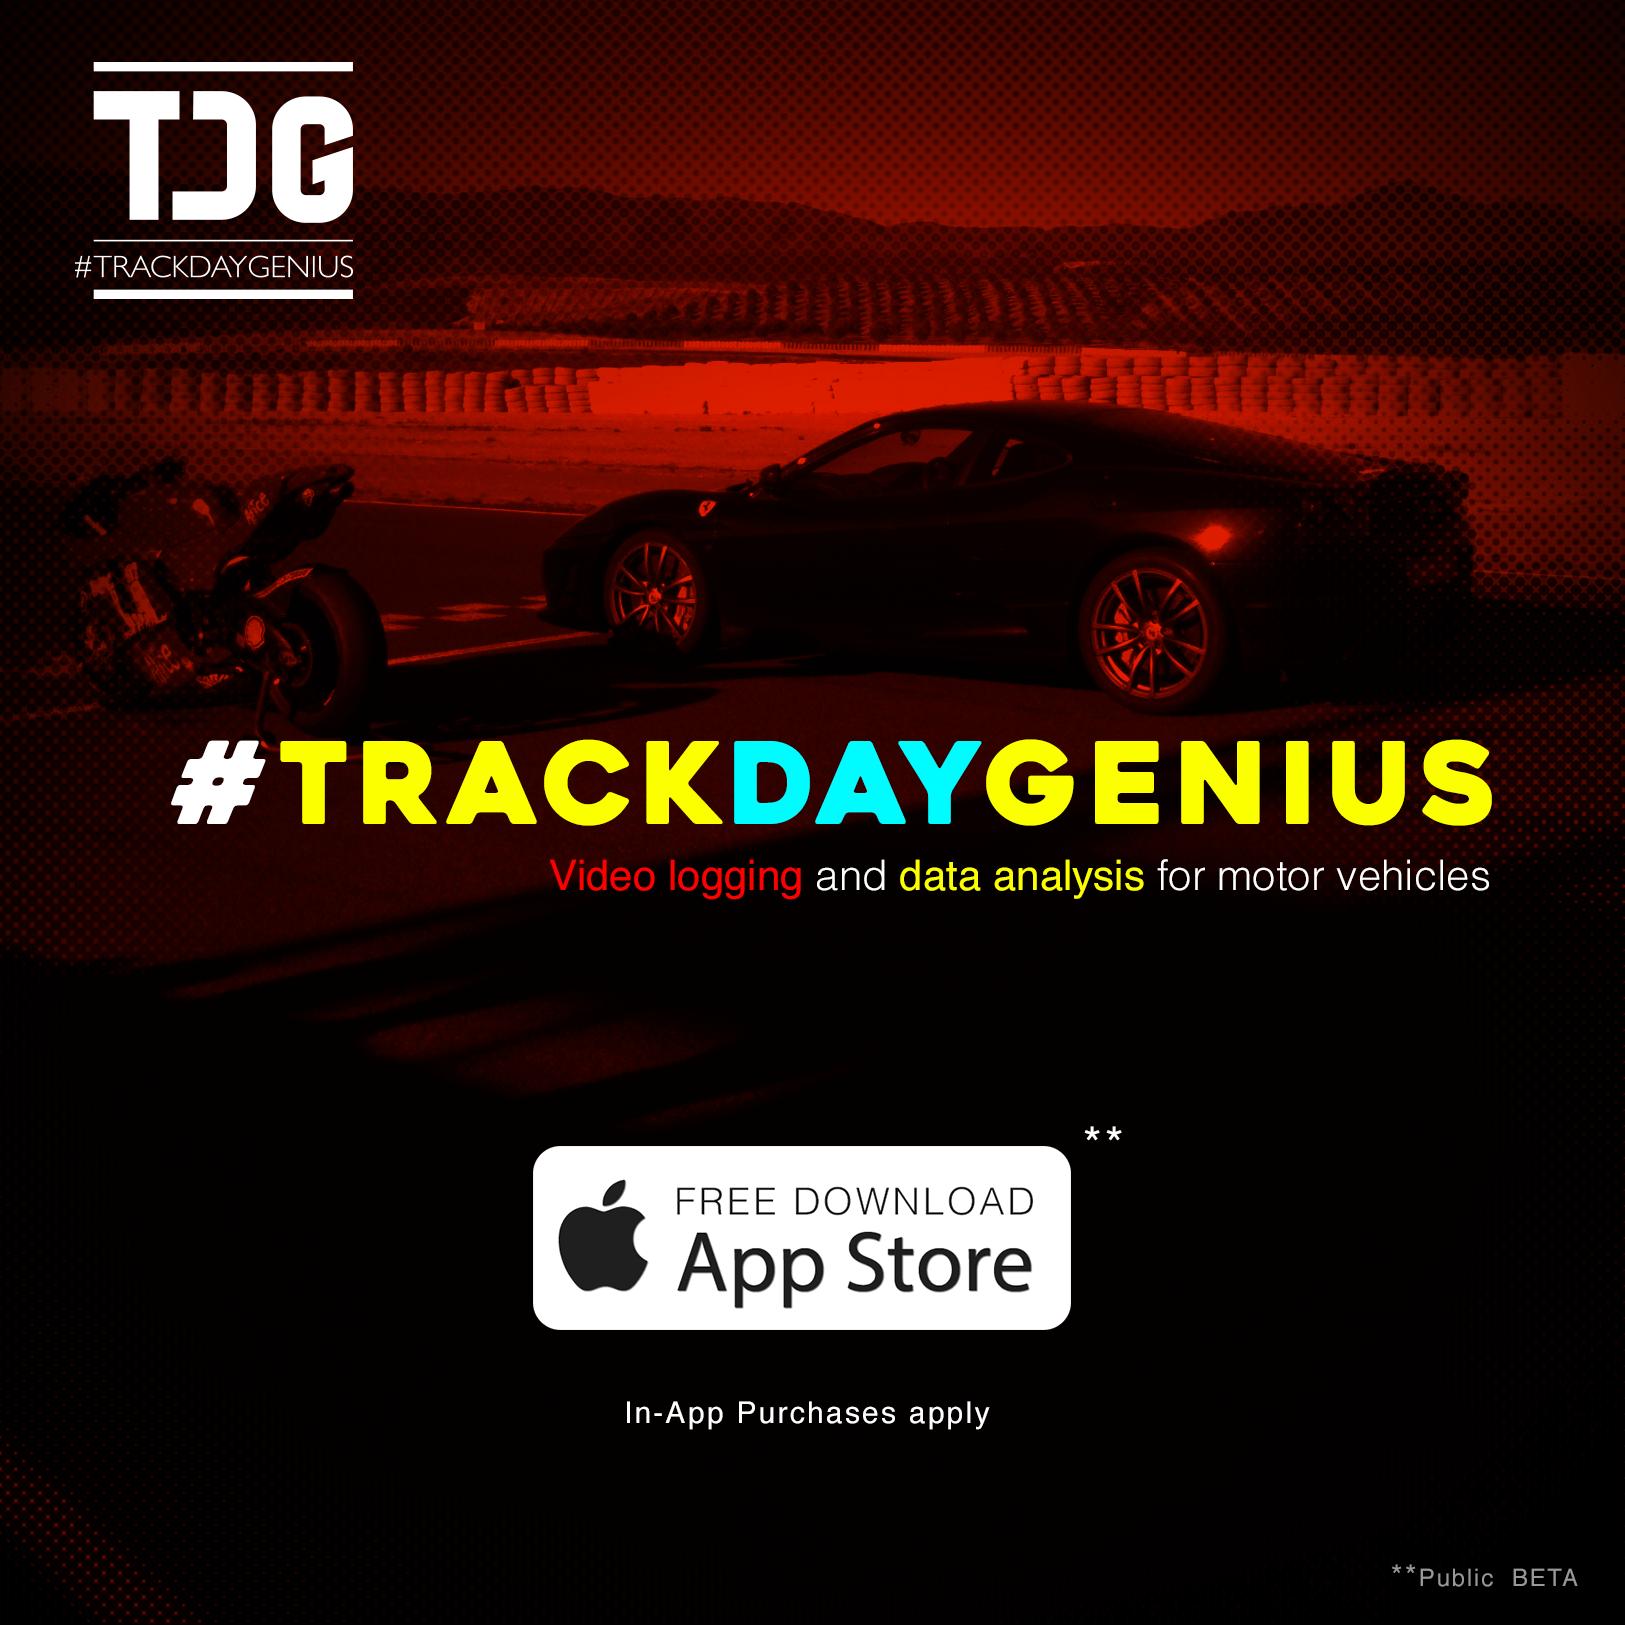 tdg-hashTag-trackDayGenius-sq